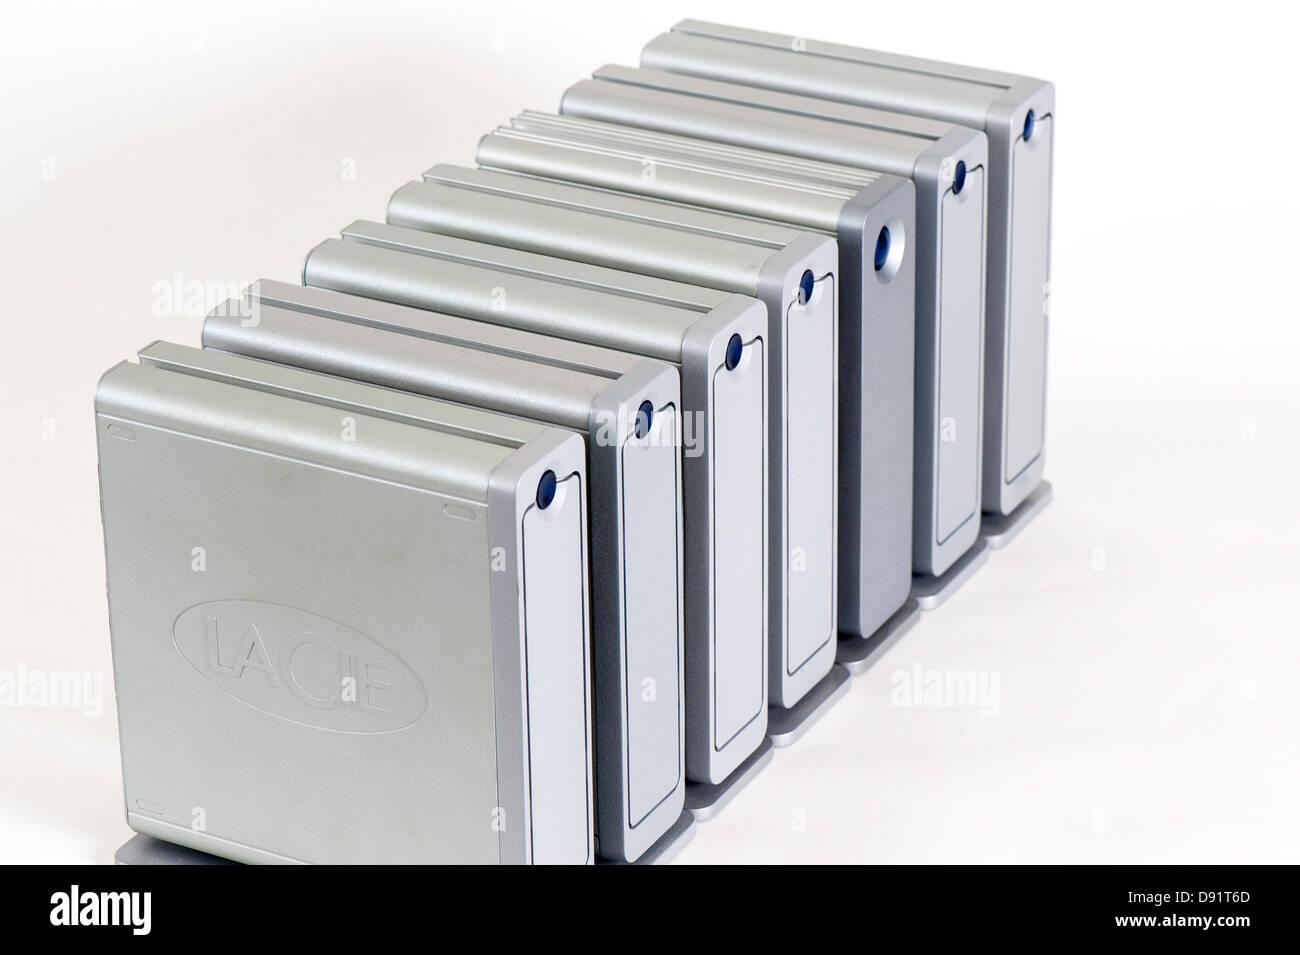 hard drive memory - Stock Image